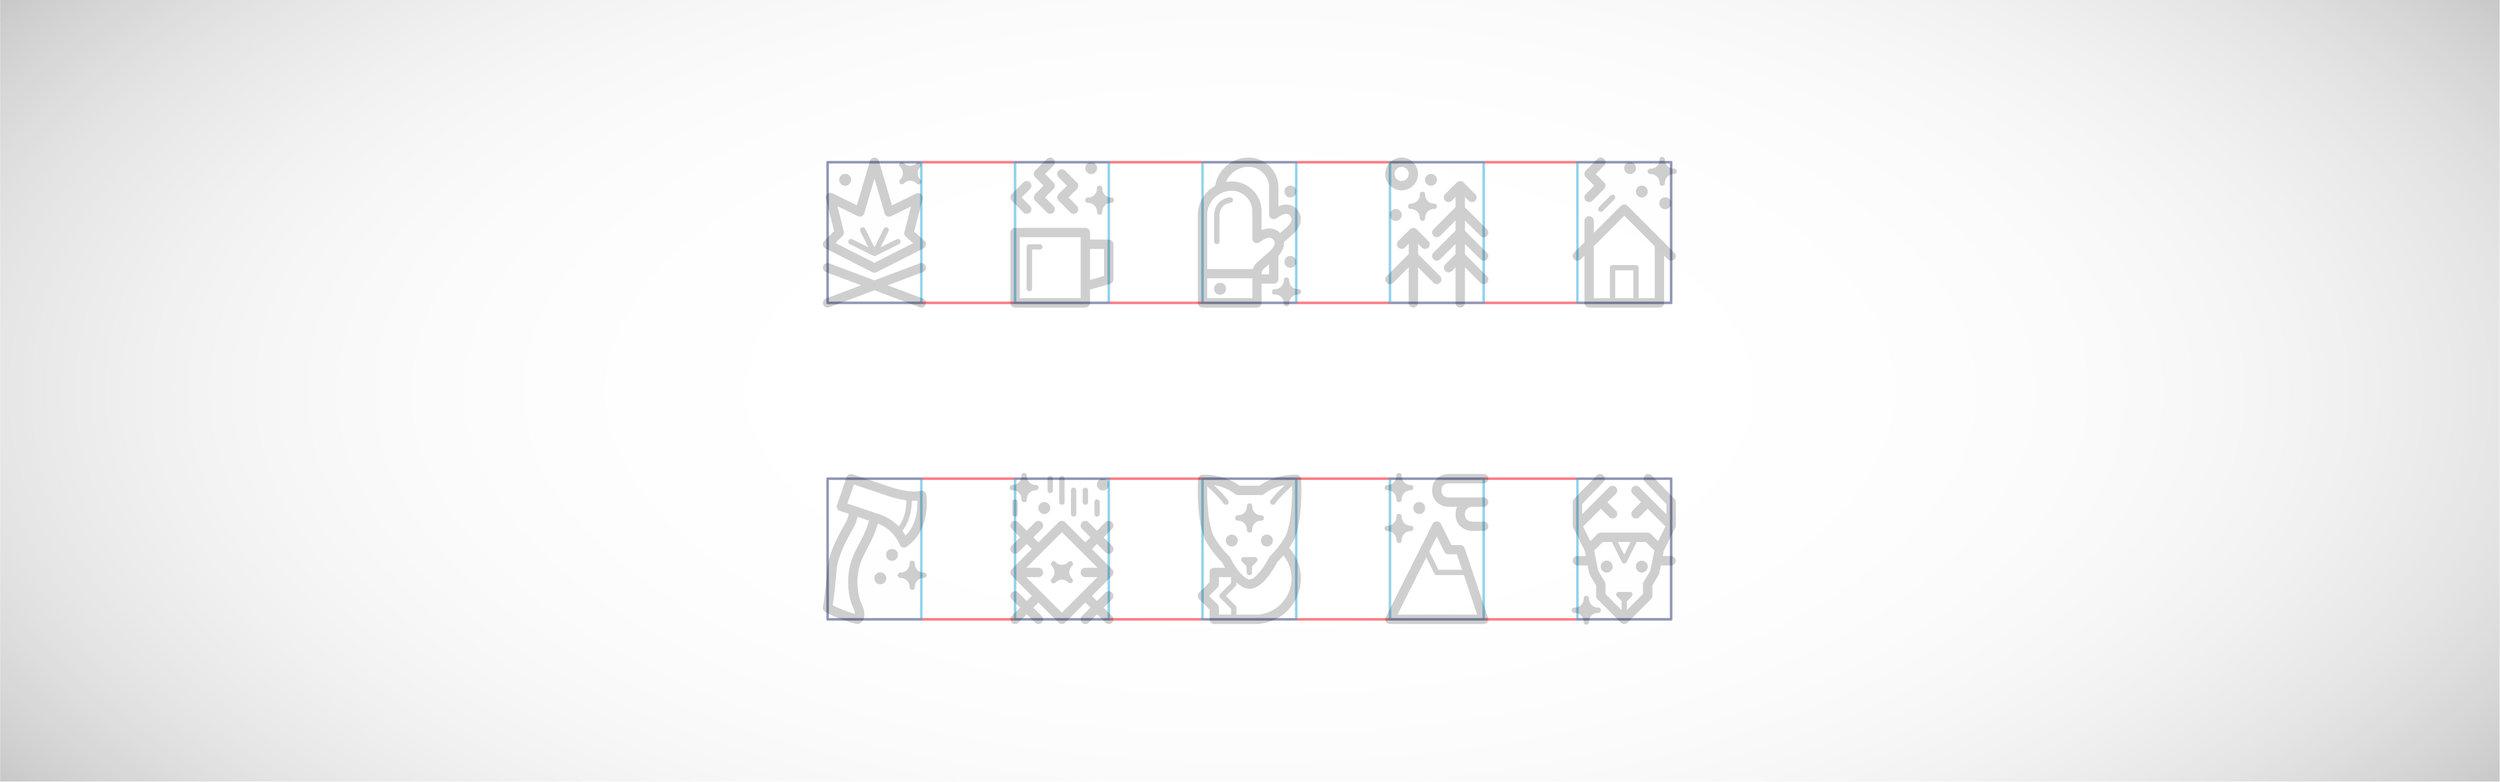 Winter Icon case study-03.jpg